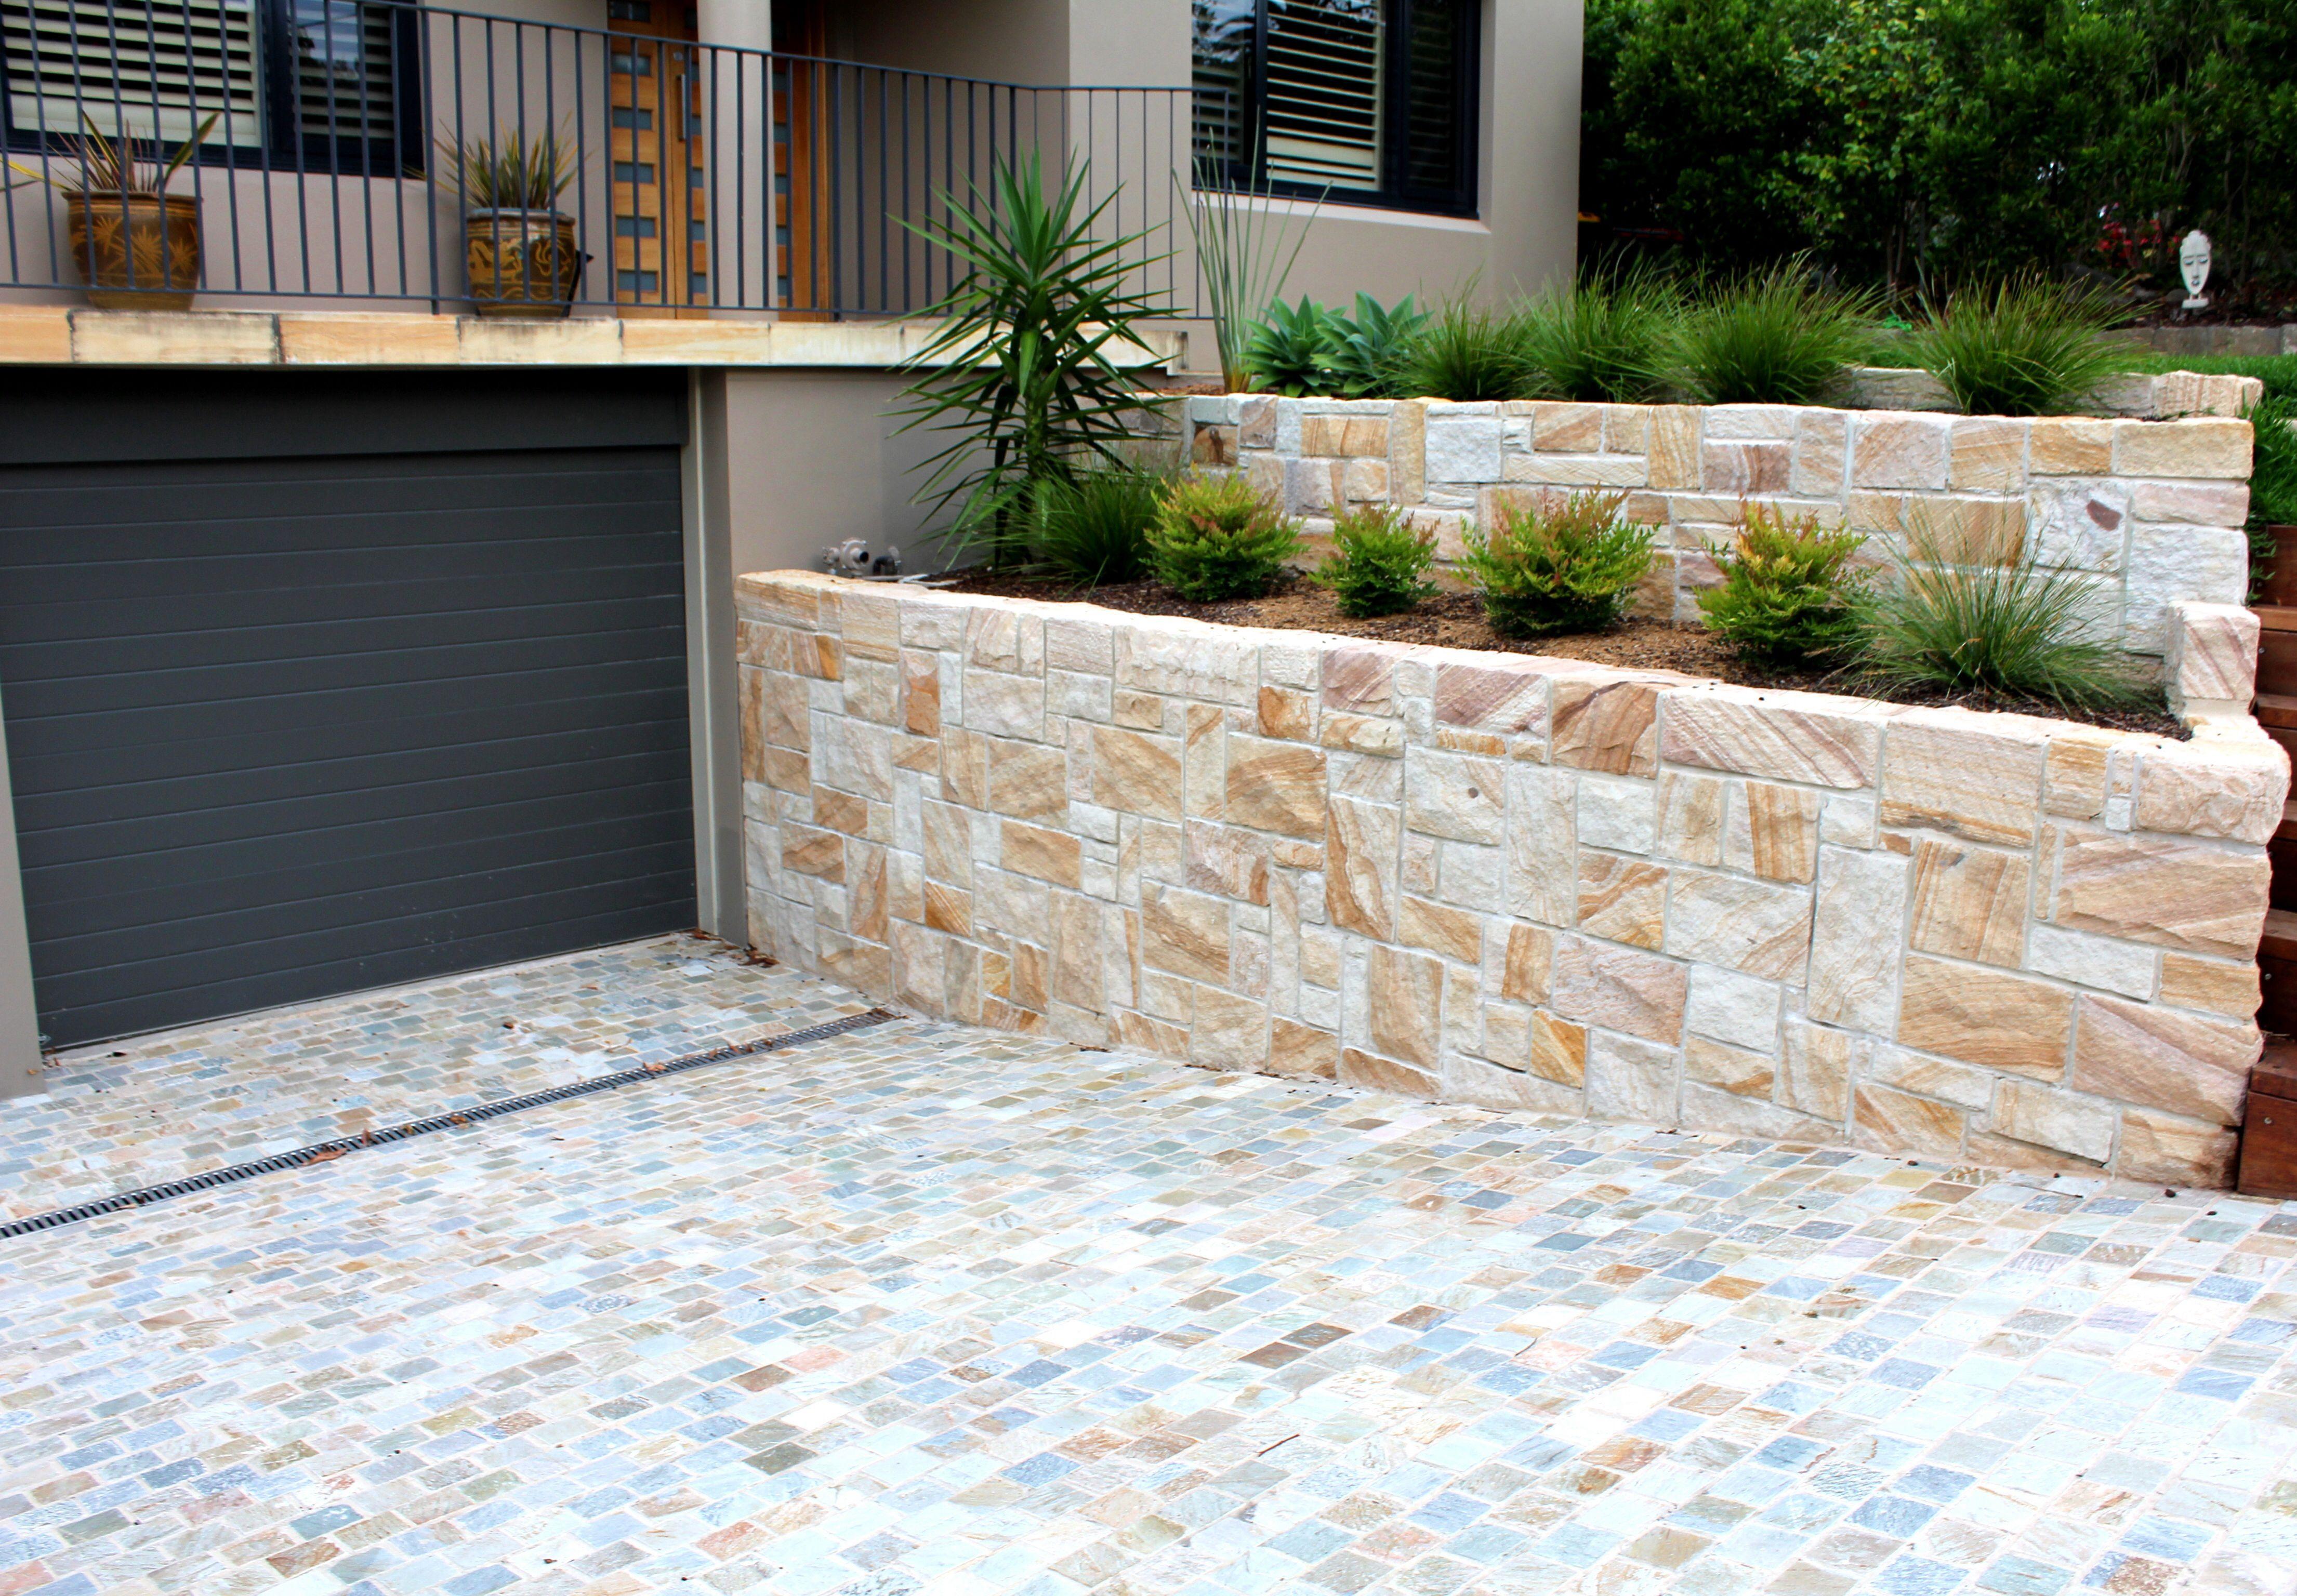 Random Ashlar Split Faced Sandstone Retaining Walls Cobb Co Cobble Stone Driveway House Cladding Stone Driveway Sandstone Wall